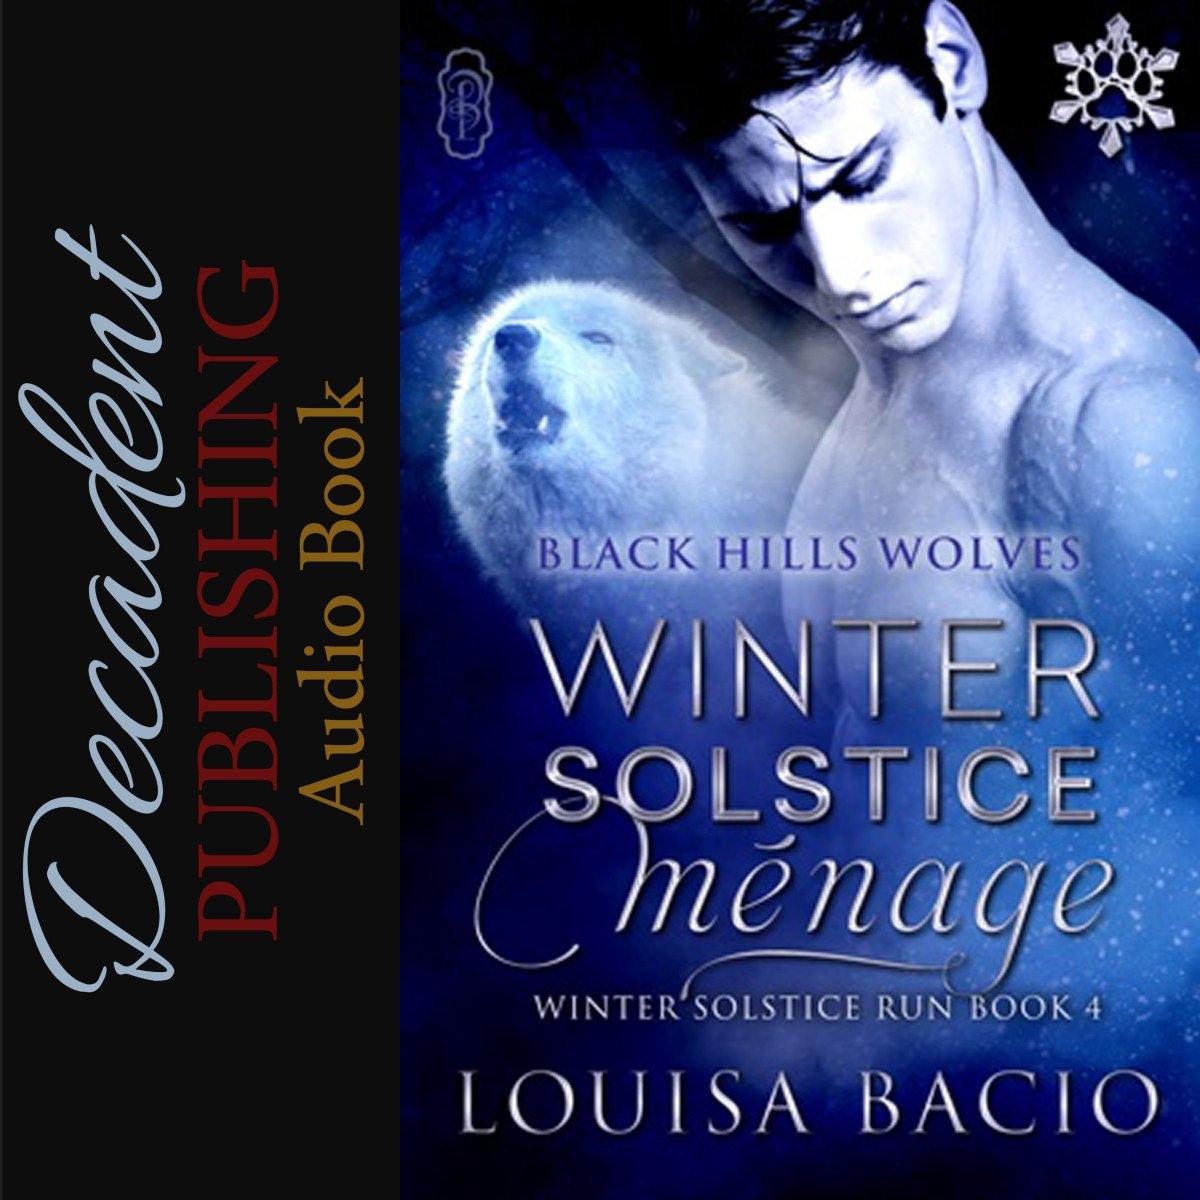 Where Sugar goes, trouble follows https://t.co/Hqg7Rocqdh @Louisabacio @mannvalerie #paranormal #romance #audiobooks https://t.co/7fZ3YLdph4